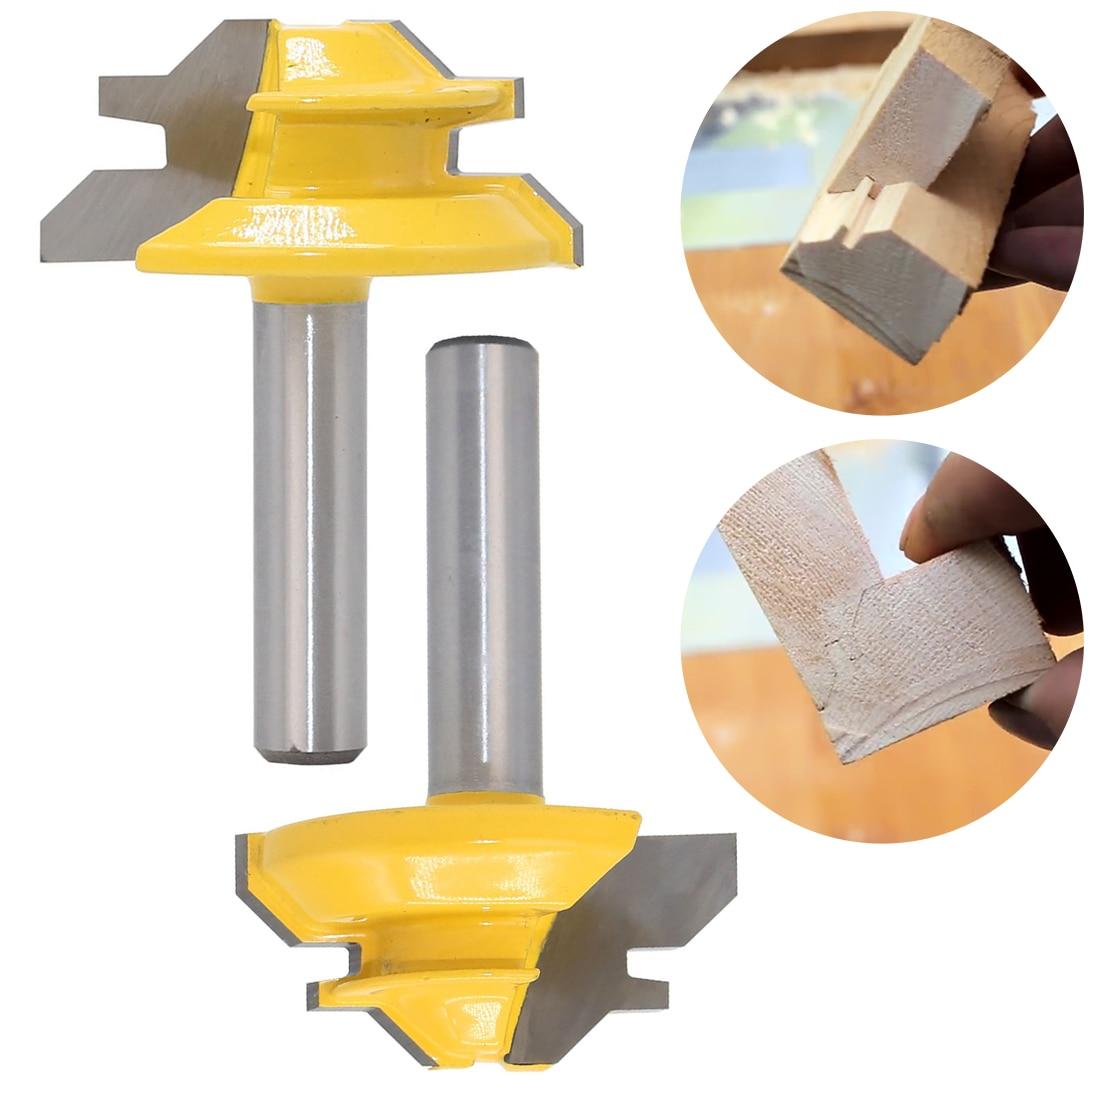 1pcs Woodworker Lock Miter Router Bit 45 Degree Width Woodworking Drill Bit 8mm Shank Tenon Cutter Woodwork Milling Cutters